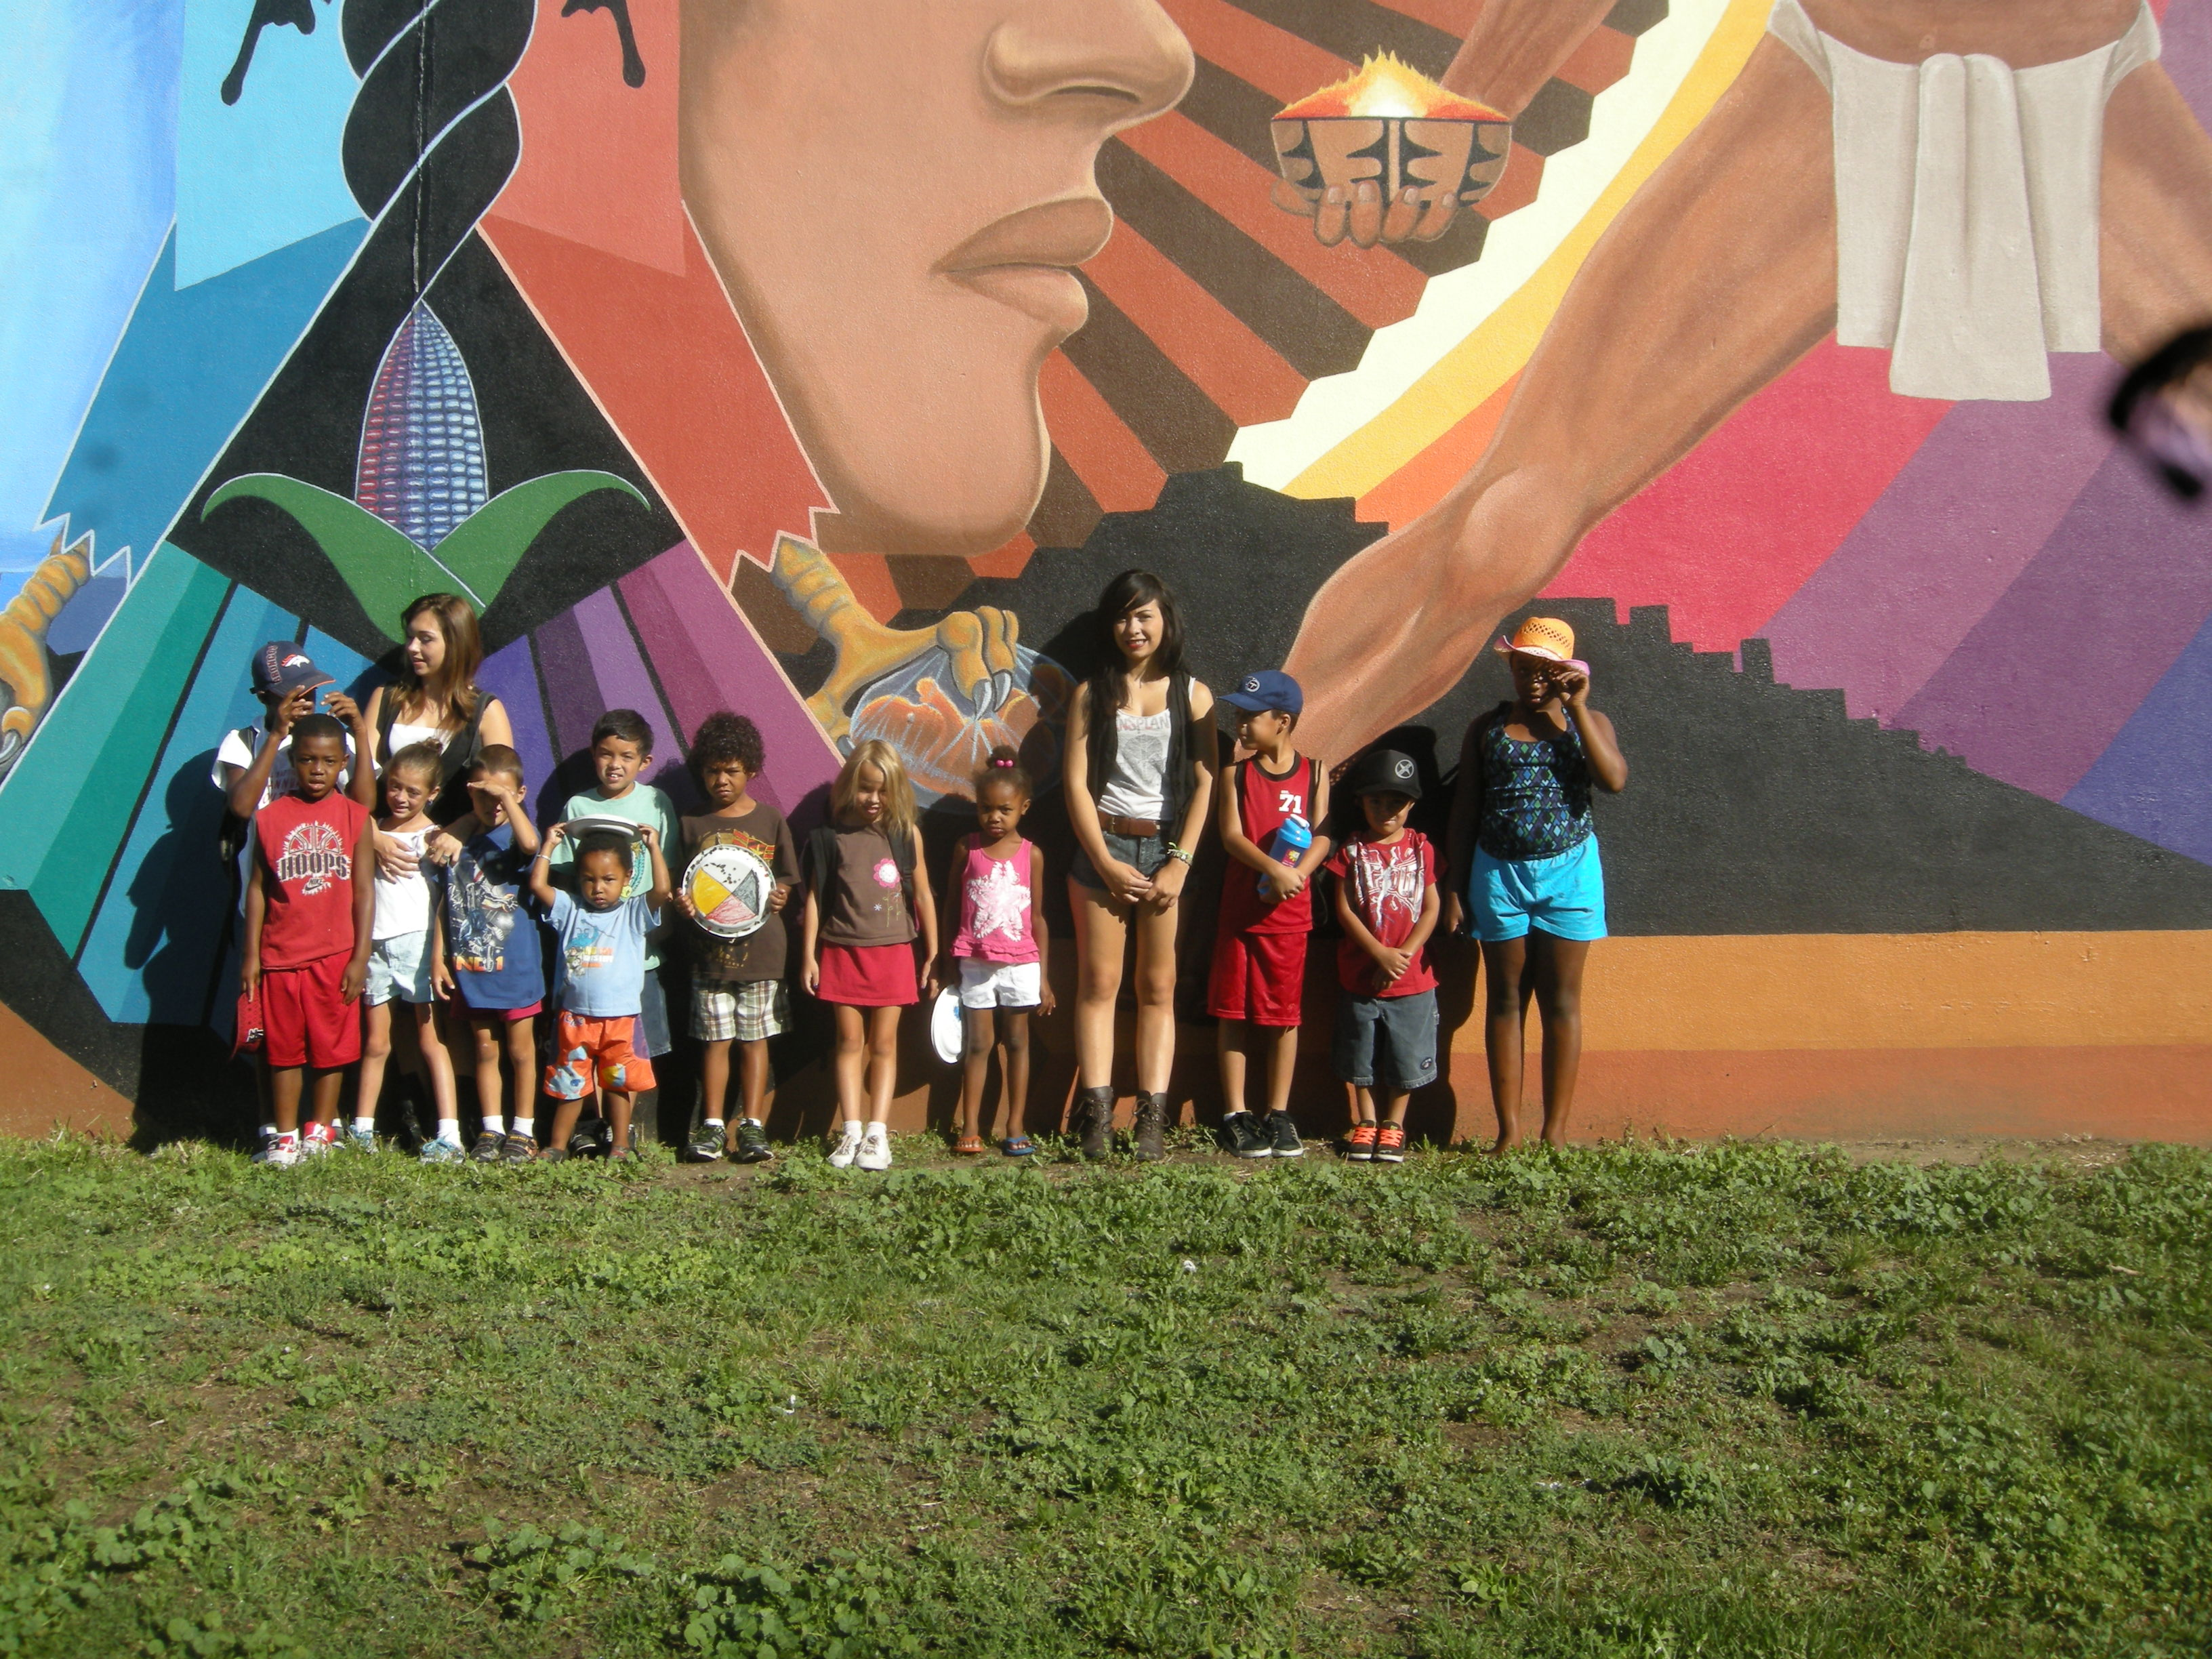 Go to the La Alma Recreation Center Summer Program page